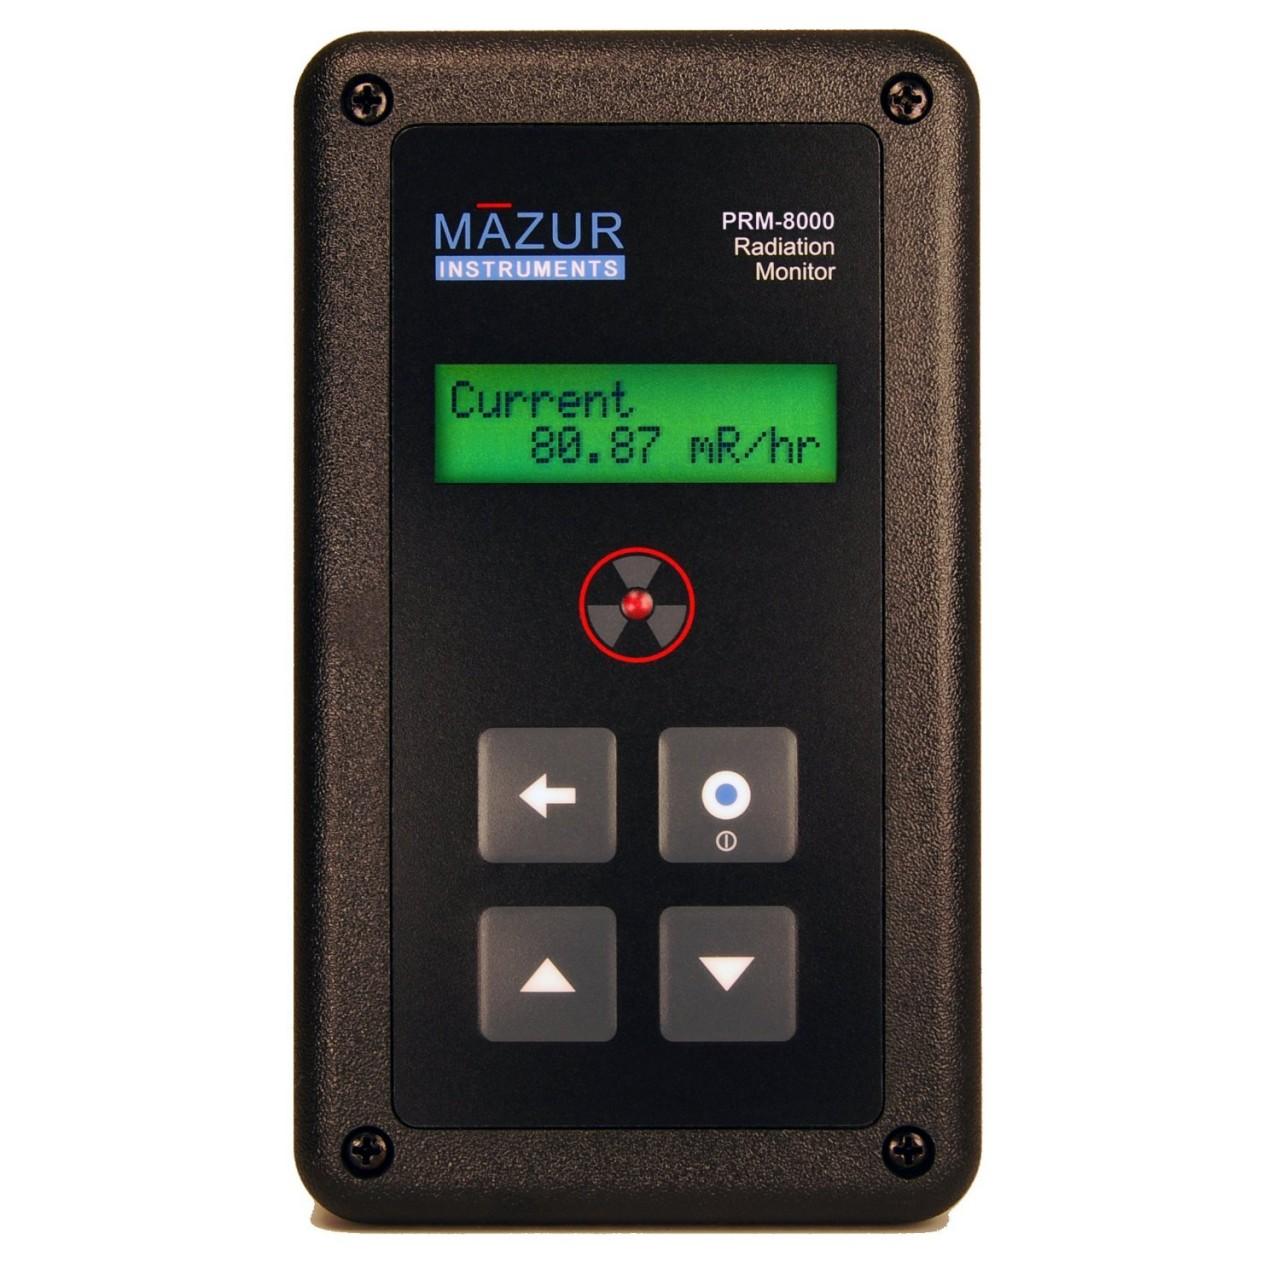 Digital Geiger Counter : Mazur prm nuclear radiation monitor